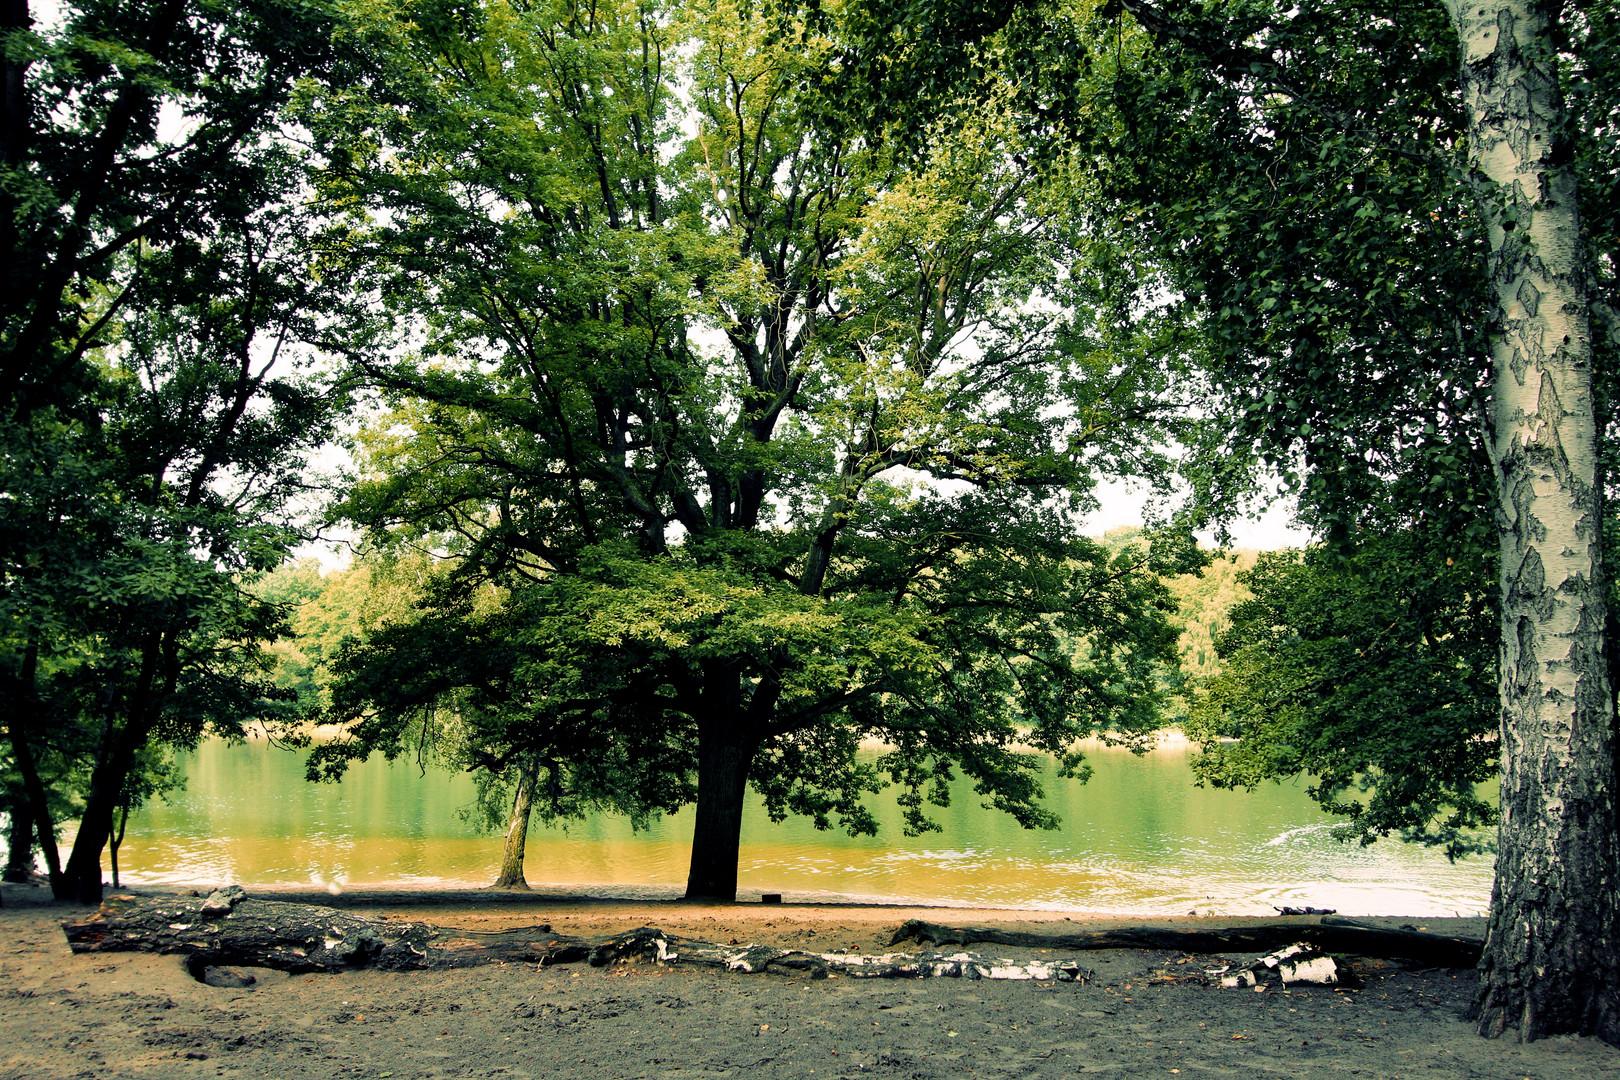 grunewald